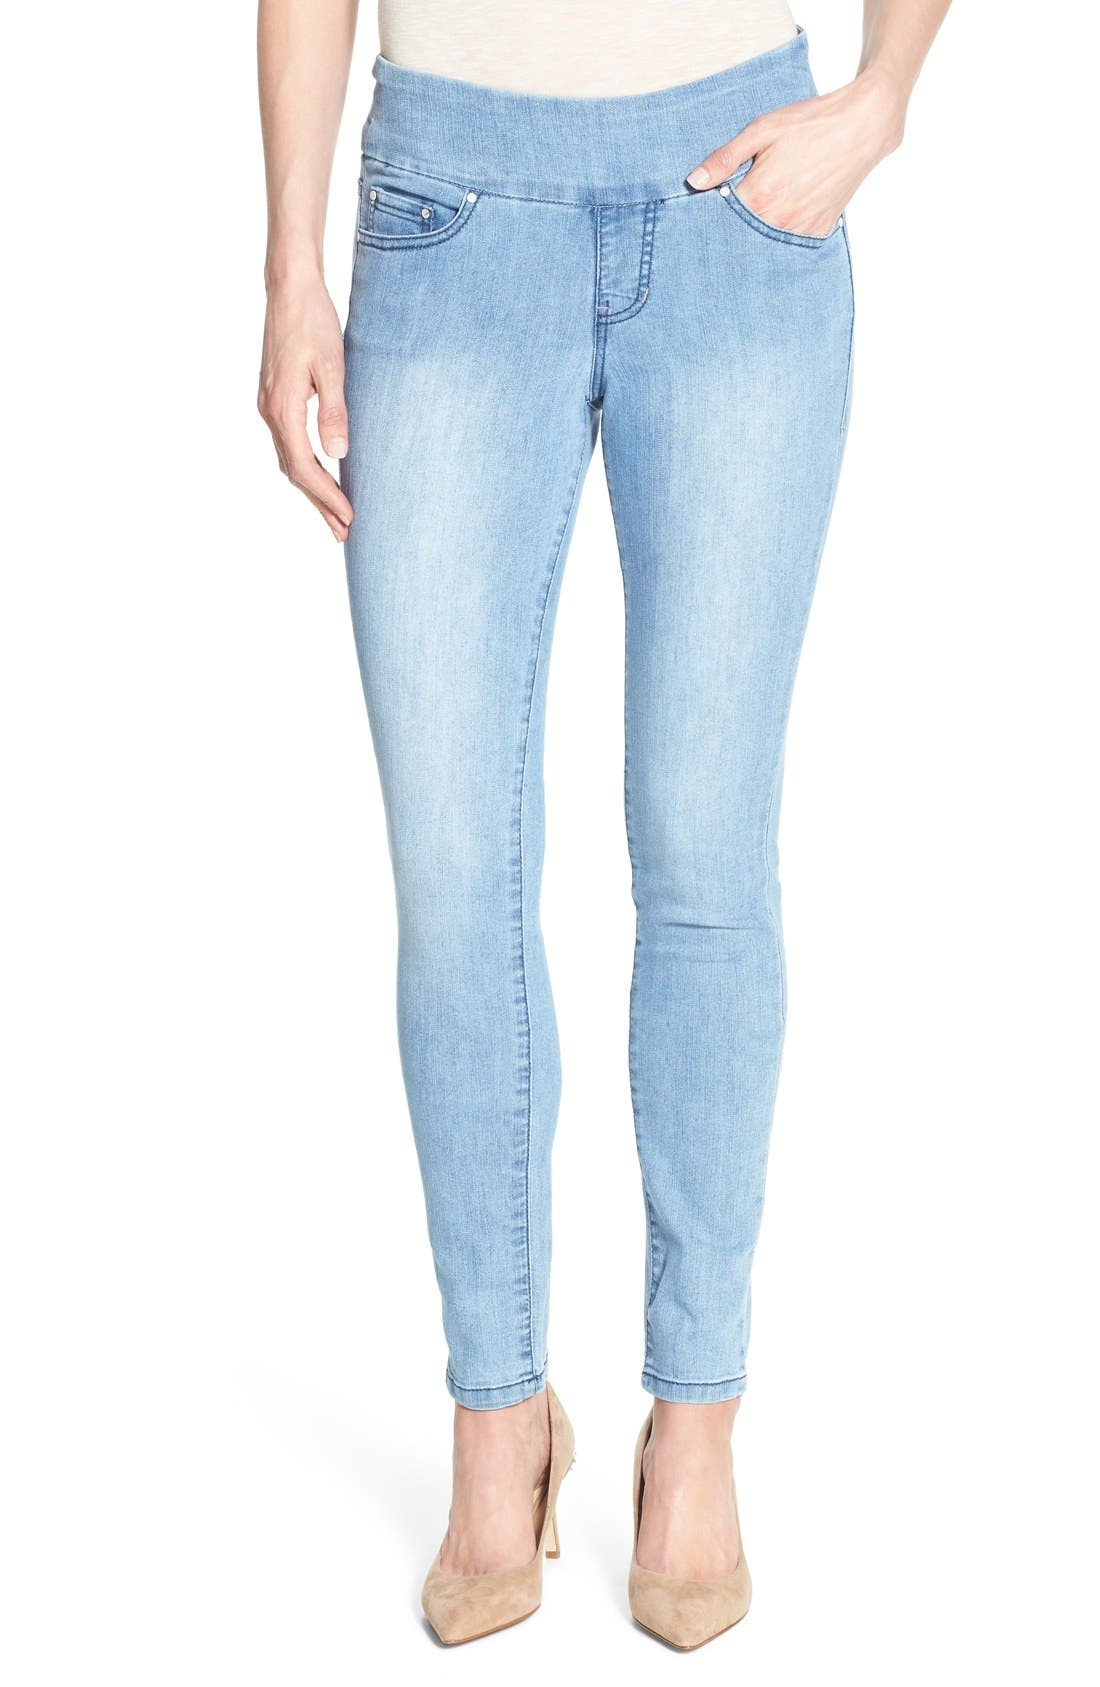 Alternate Image 4  - Jag Jeans 'Nora' Pull-On Stretch Skinny Jeans (Southern Sky)